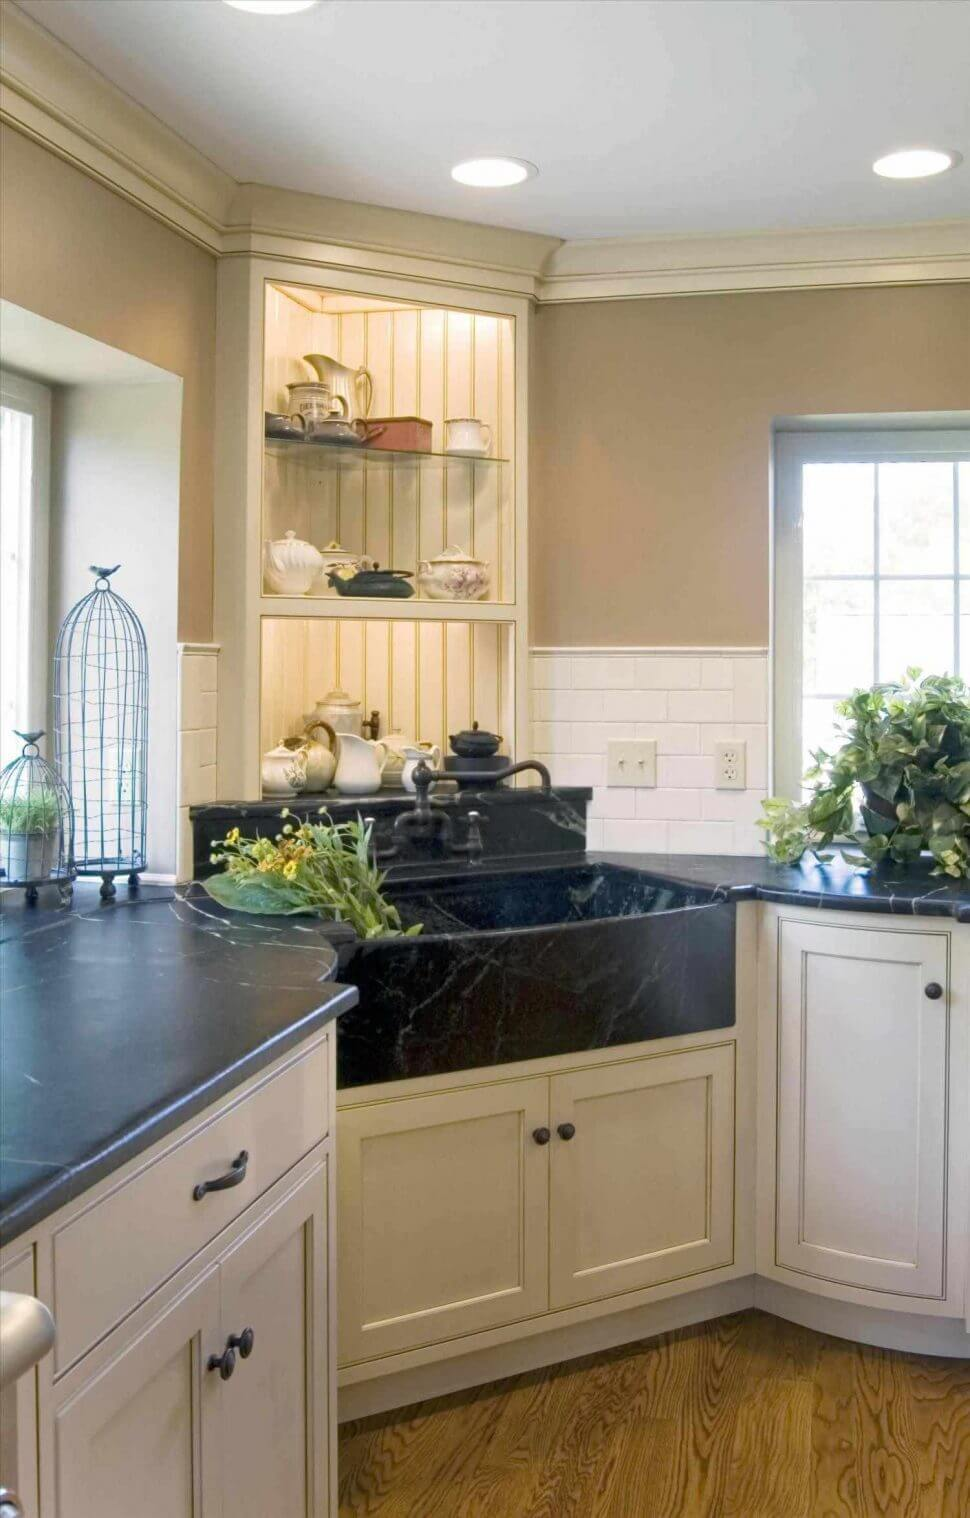 26 Farmhouse Kitchen Sink Ideas and Designs for 2020 on Kitchen Sink Ideas  id=35332